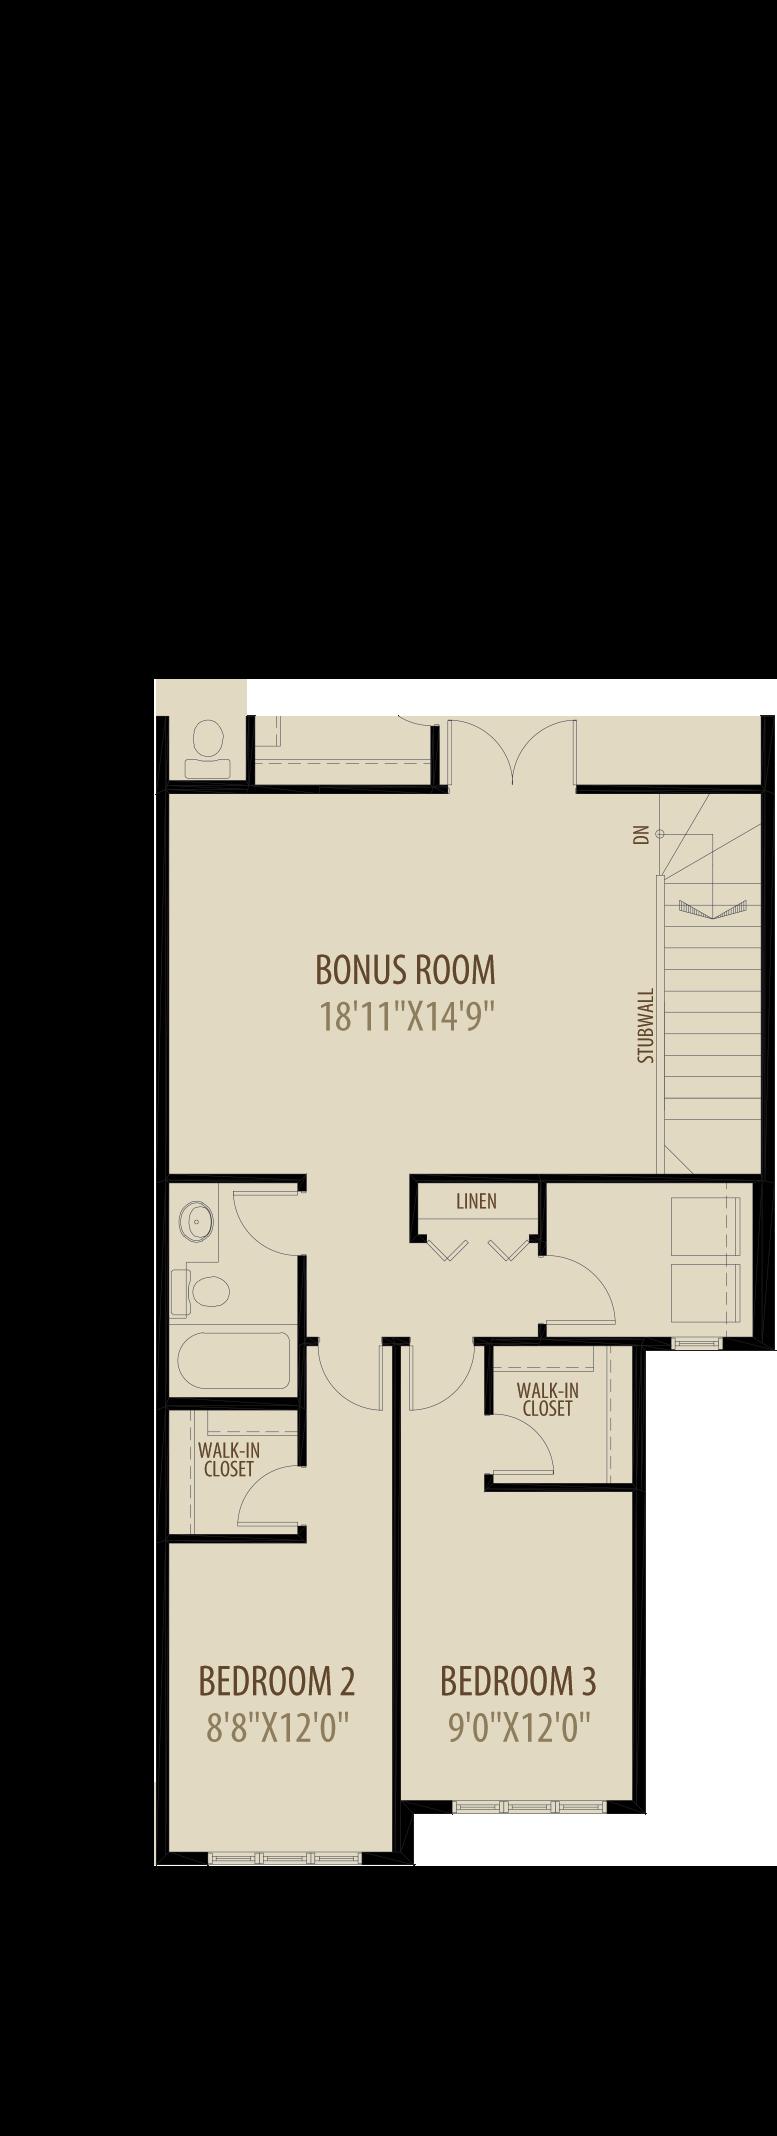 Option 2 Revised Upper Floor Adds 209Sq Ft